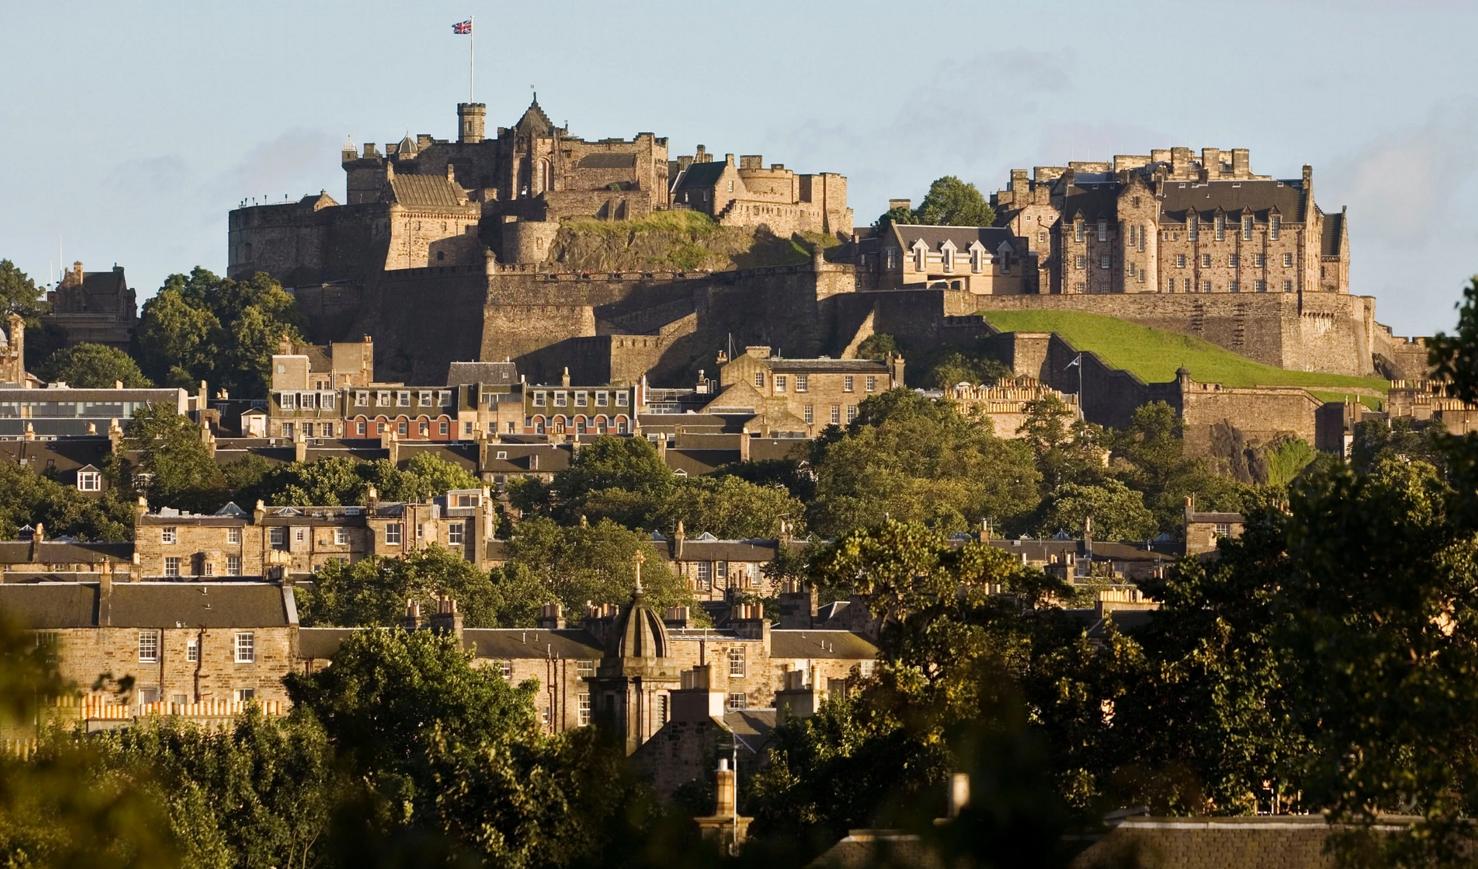 On Edinburgh, Scotland  December 26, 2015—The Guardian